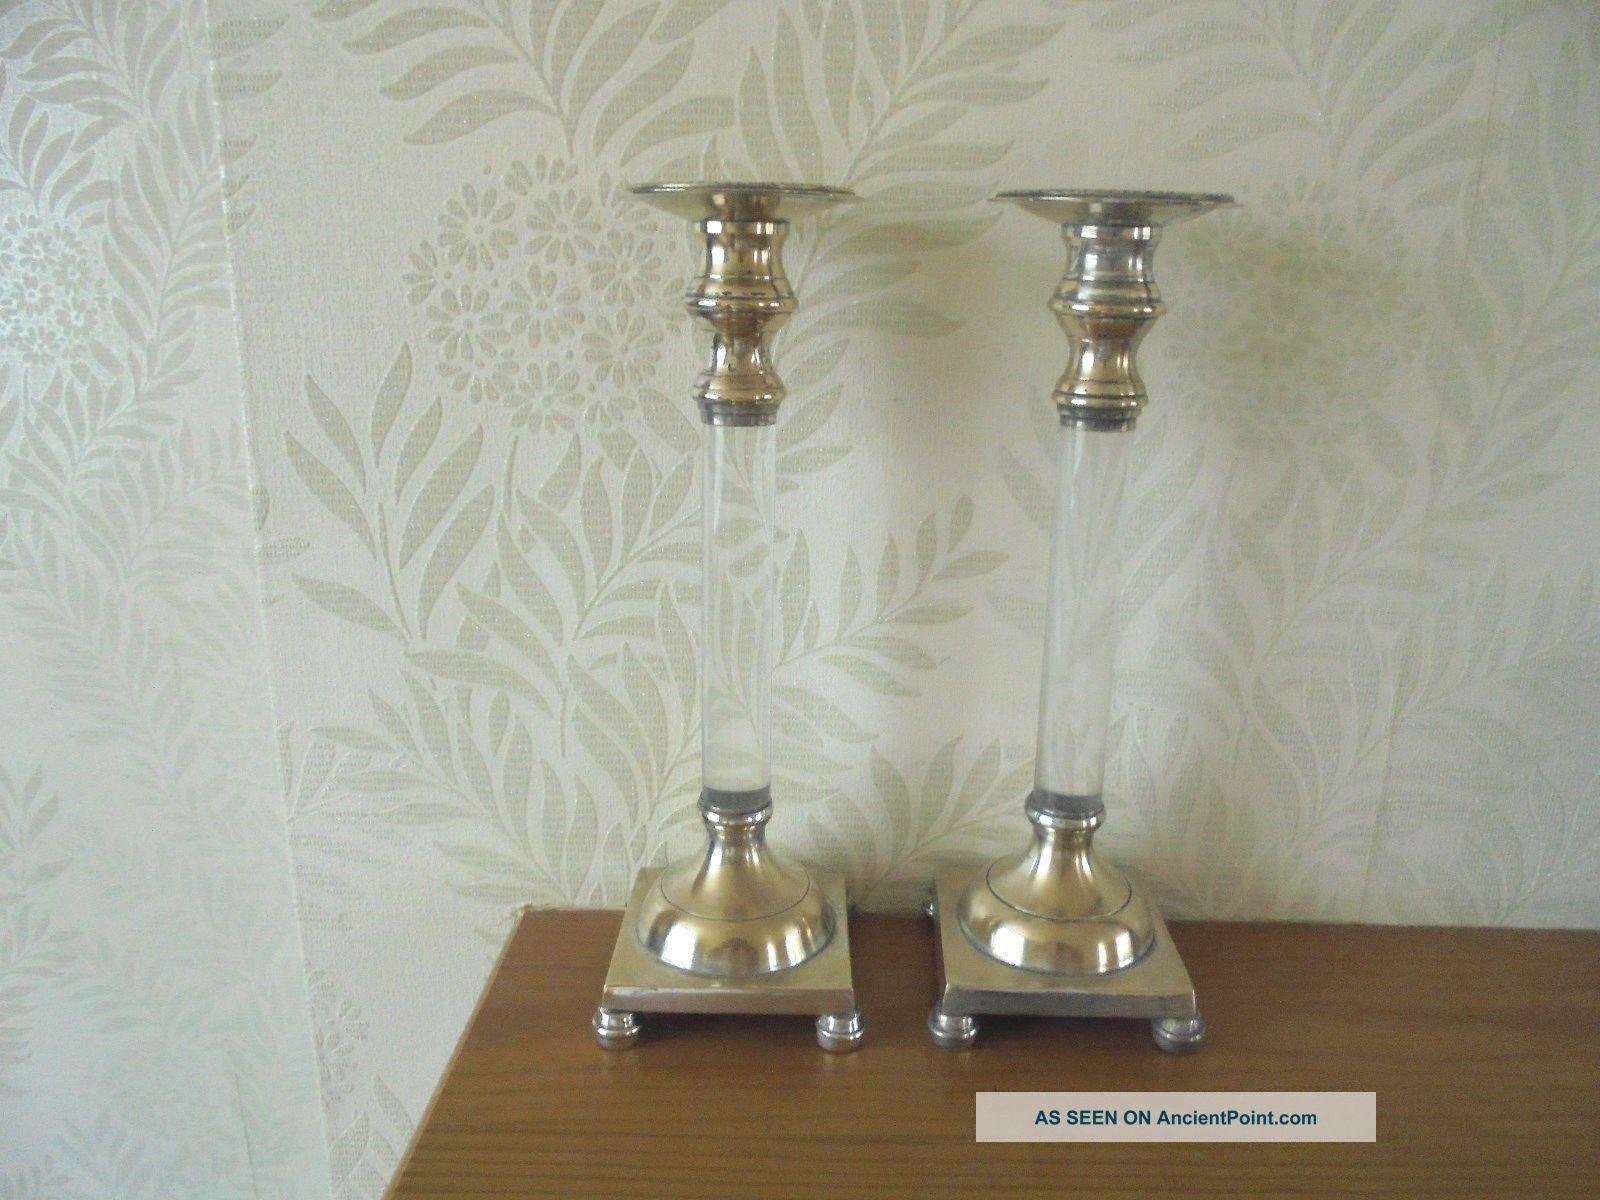 Silver Plated & Glass Candlesticks Candlesticks & Candelabra photo